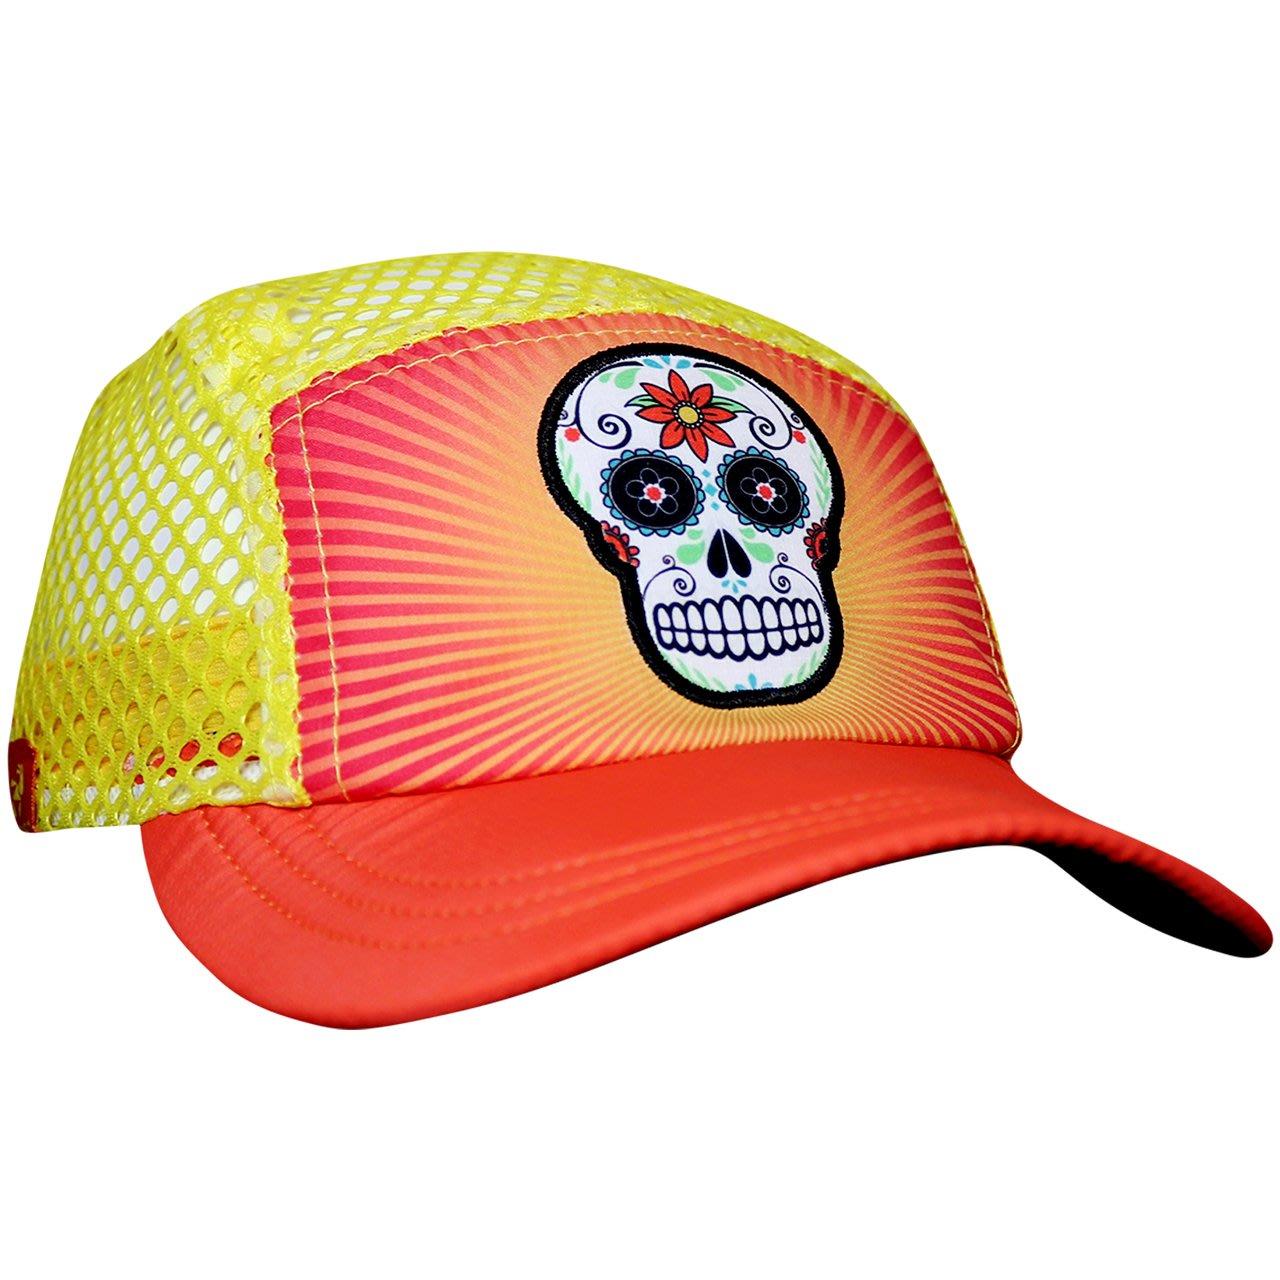 Orange Sugar Skull軟檐帽摺疊收納方便汗淂HEADSWEATS運動帽.另推薦由4支回收寶特瓶製成運動衣.